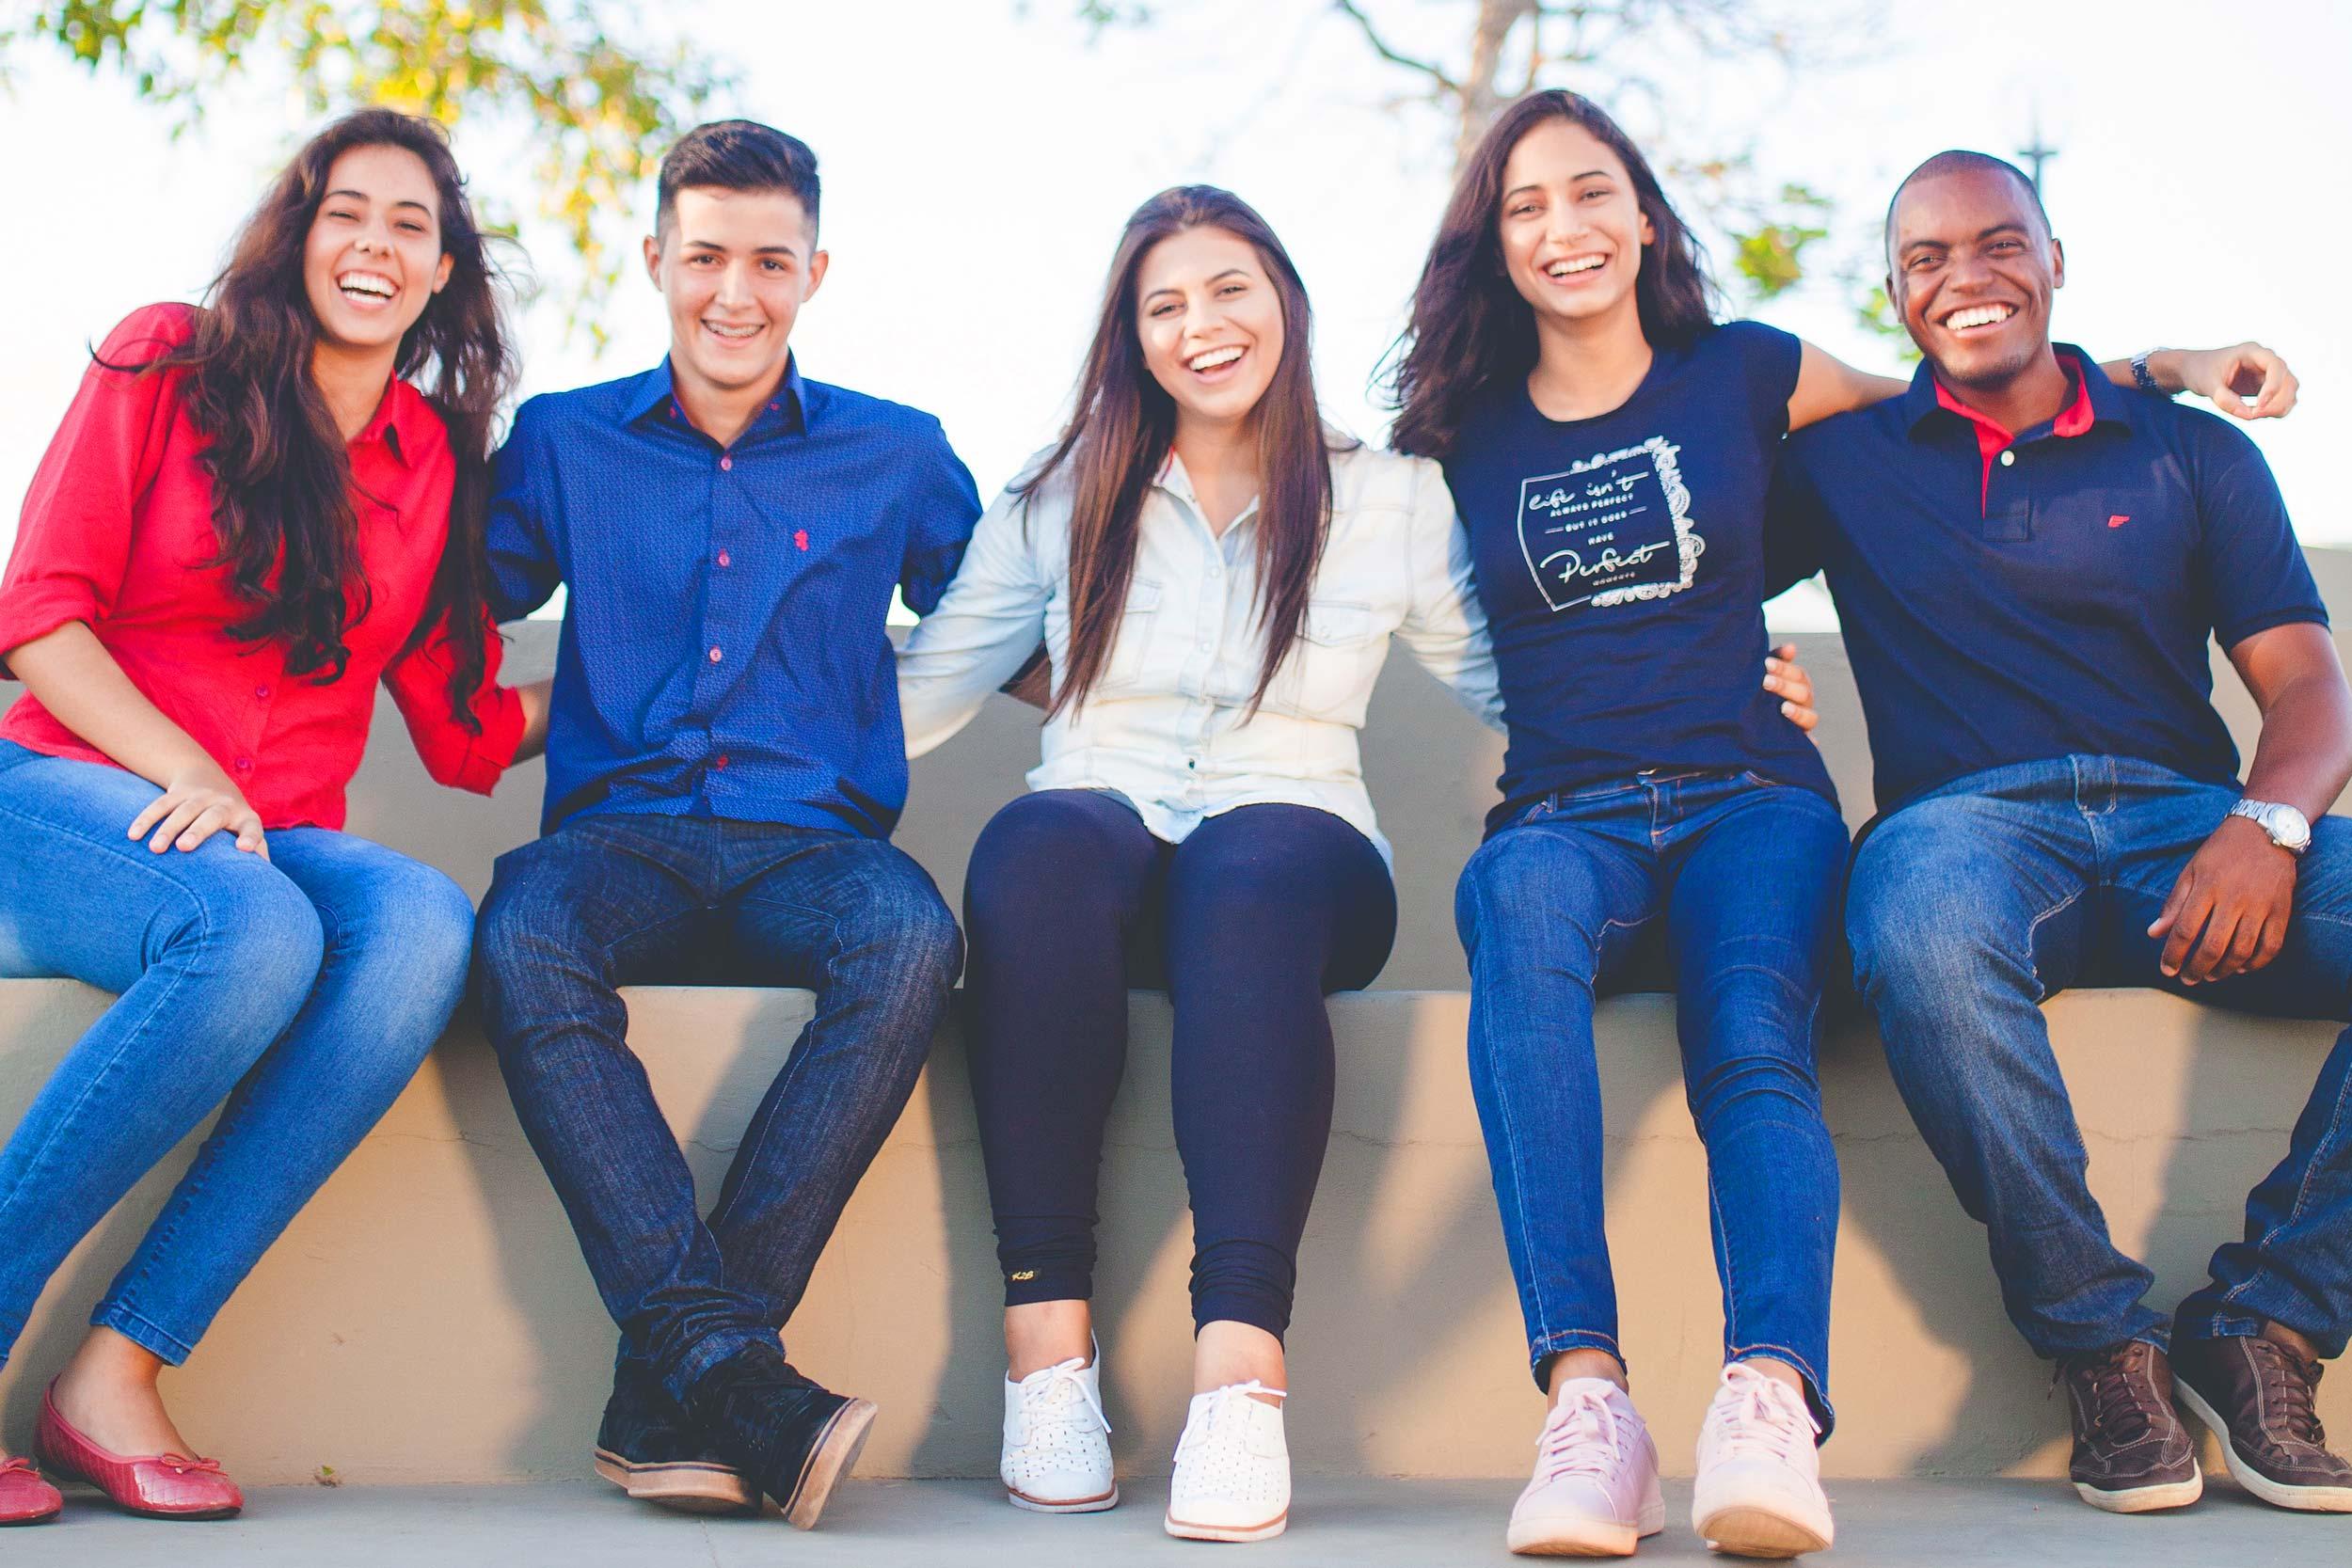 Tuition Reimbursement and Education Opportunities